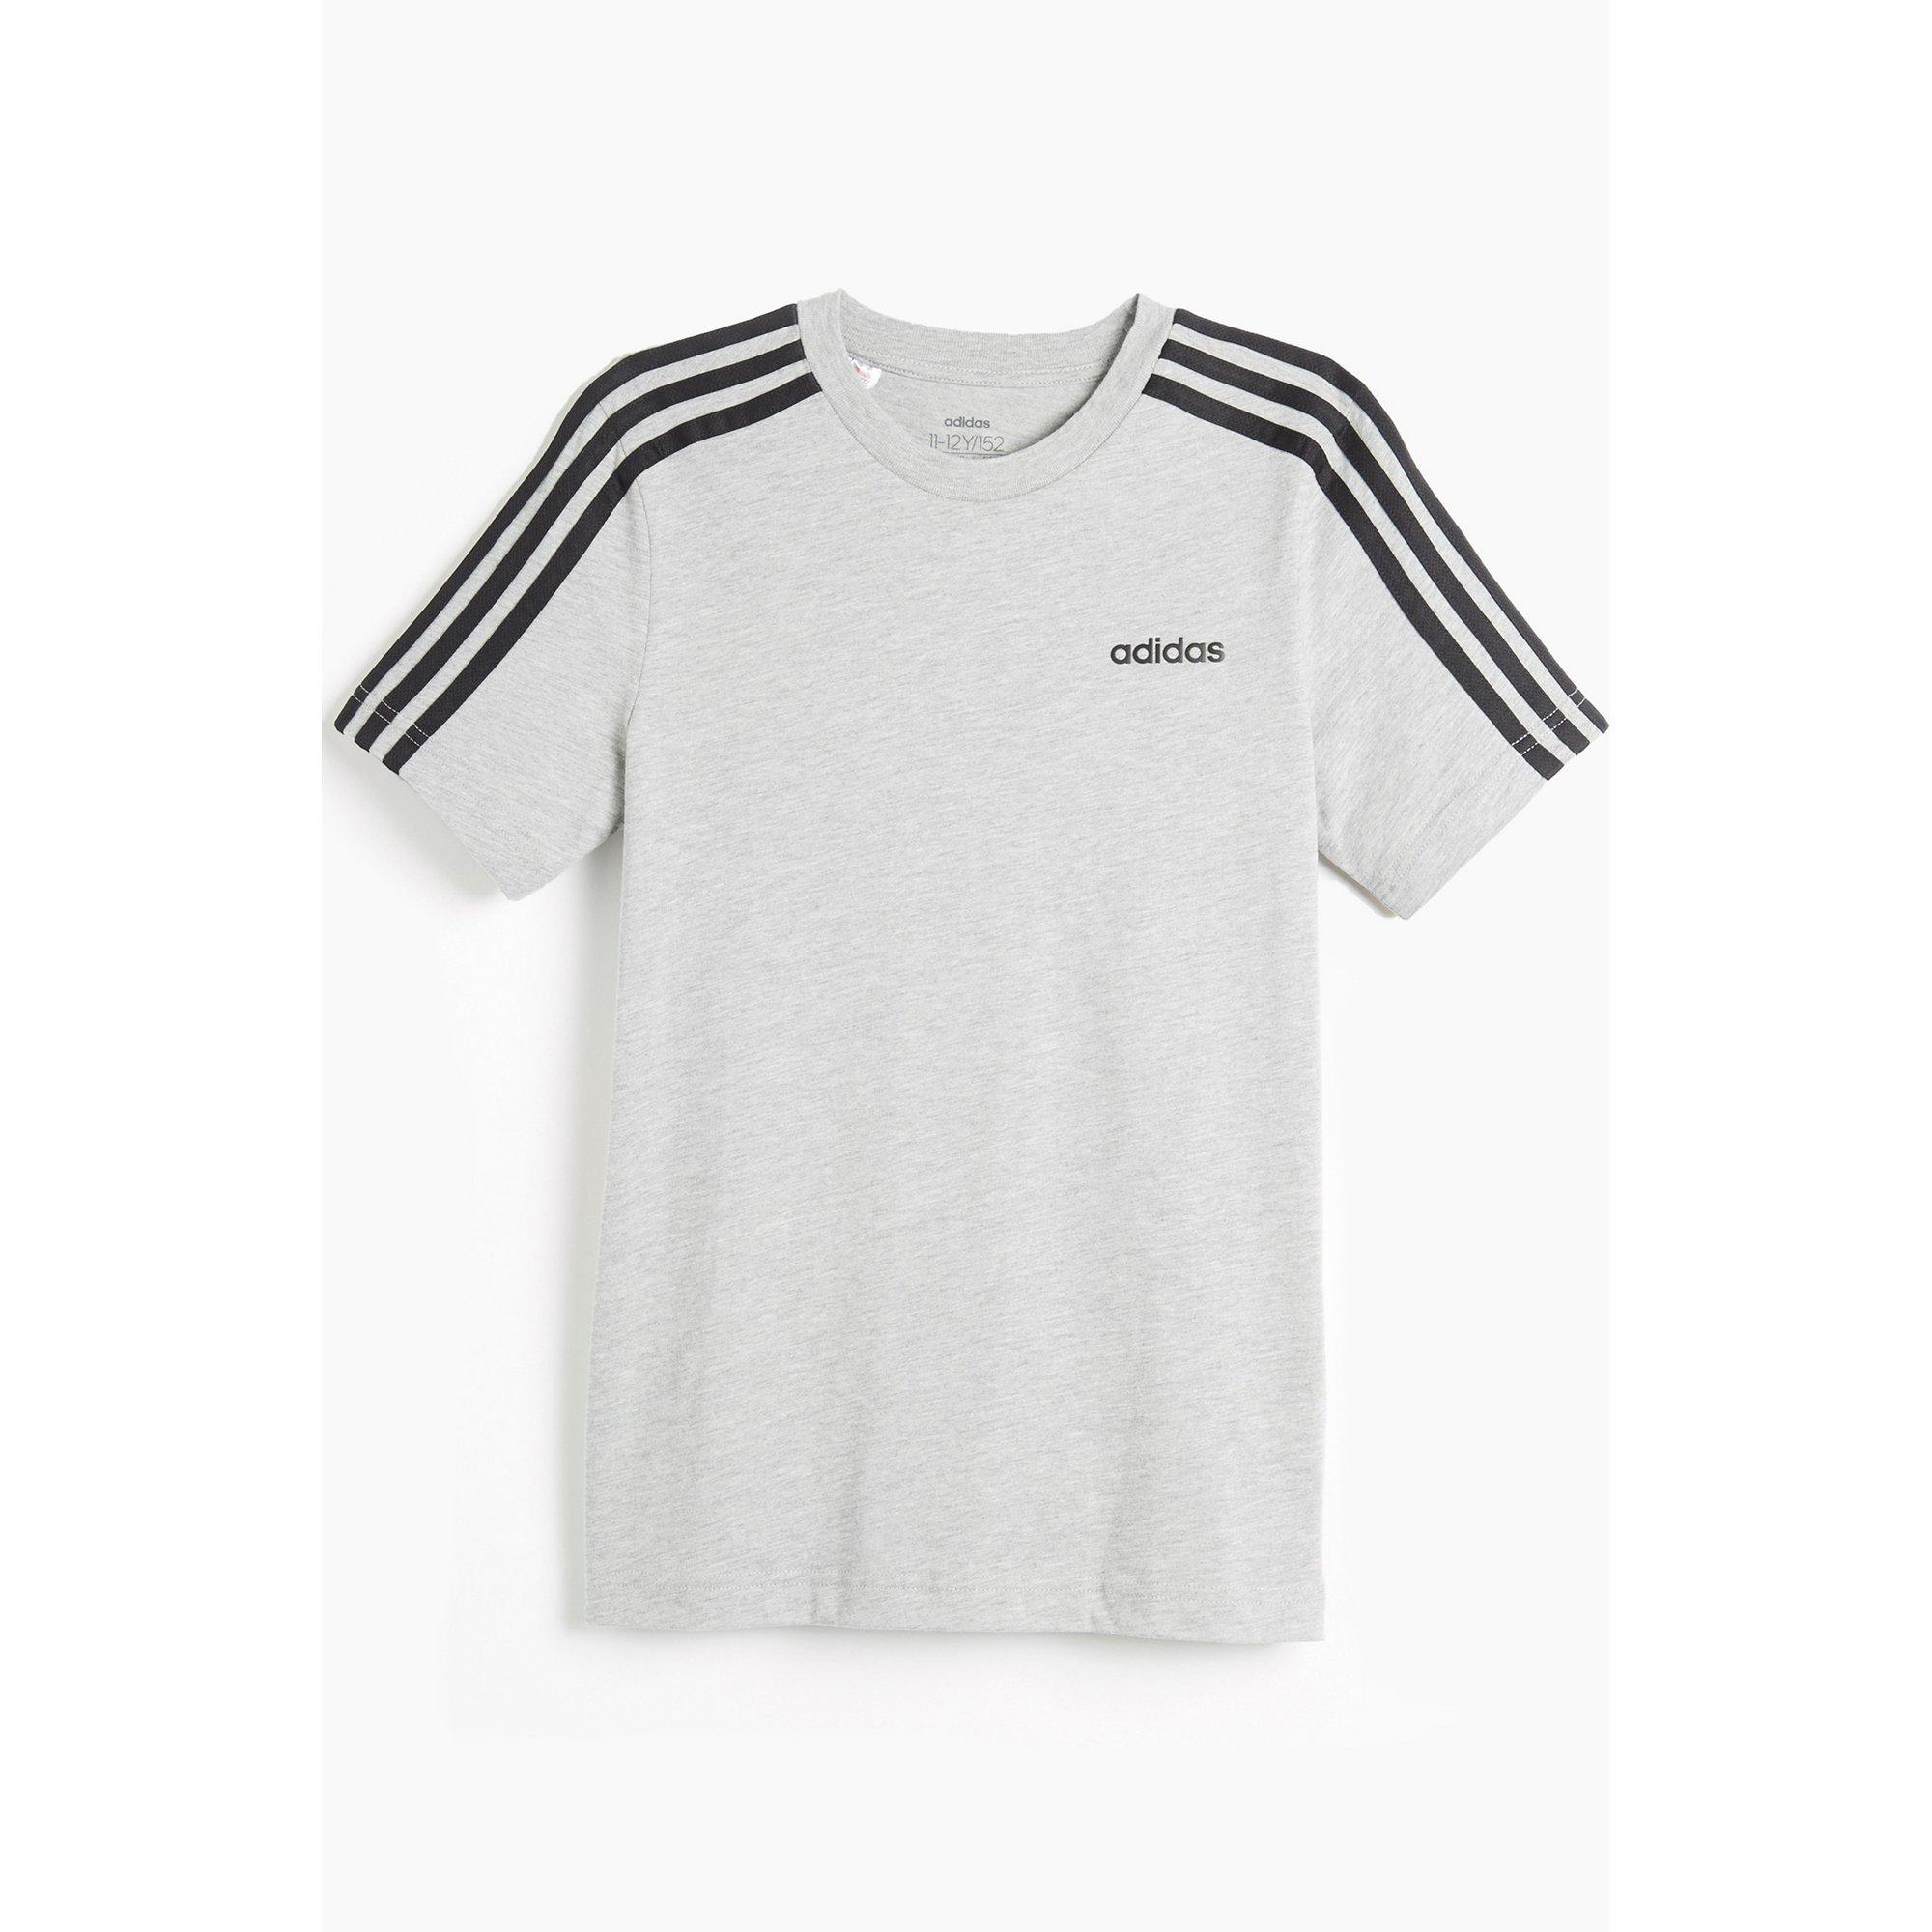 Image of Boys adidas Essentials Grey T-Shirt